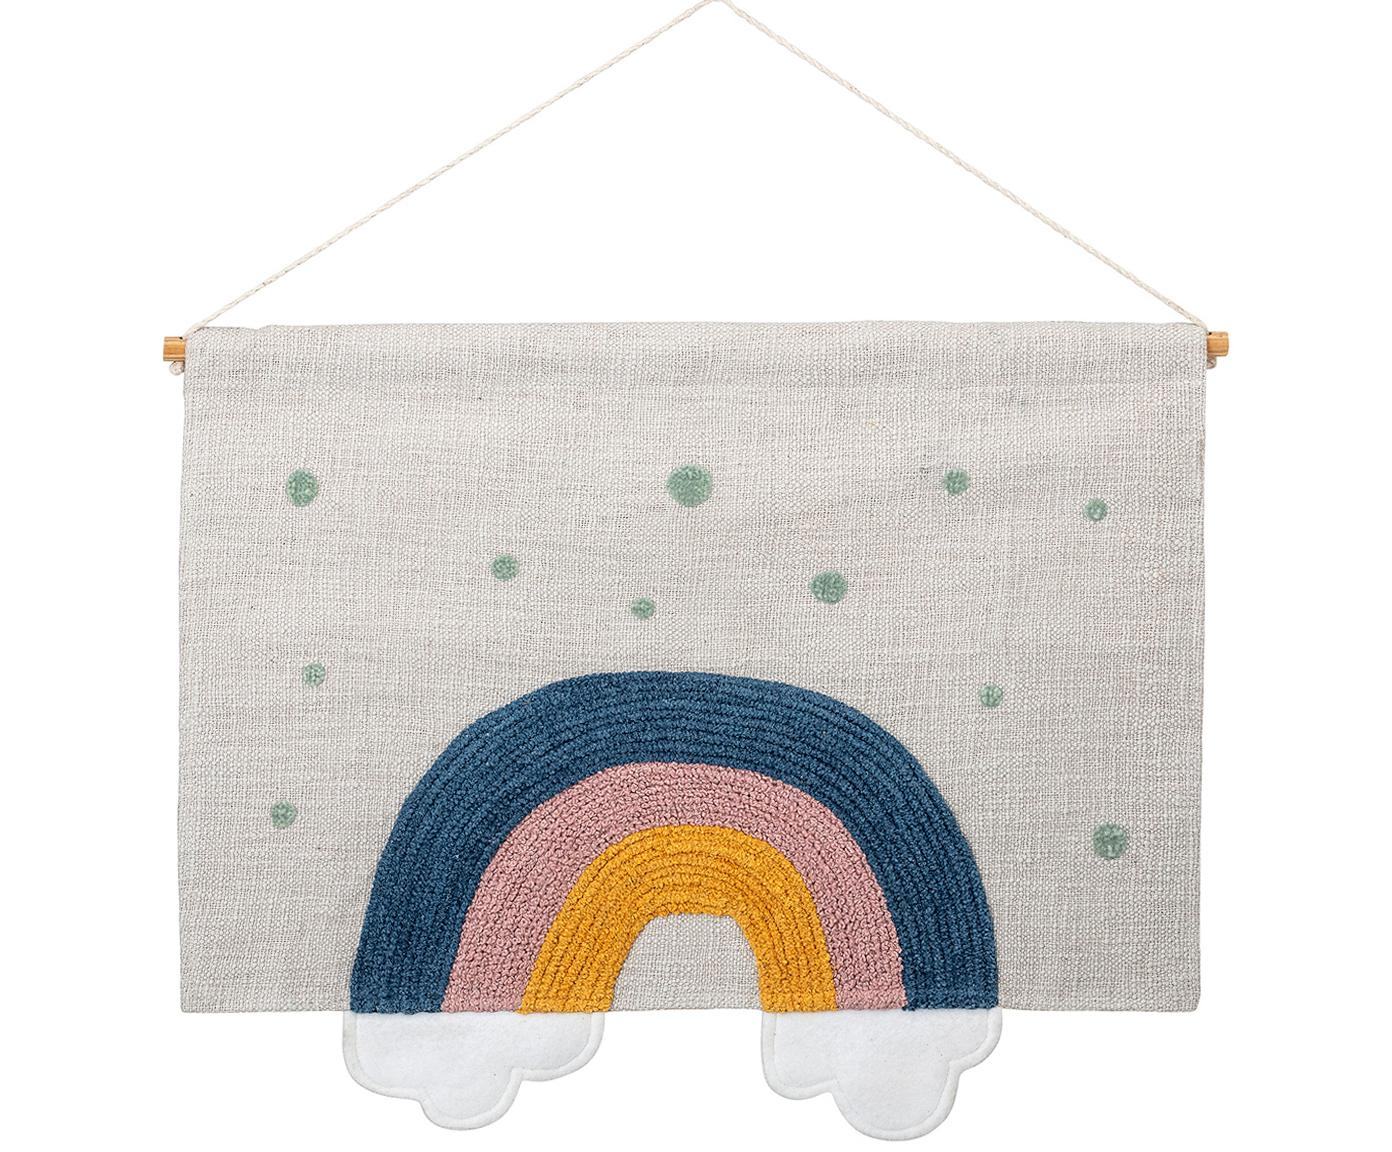 Grosses Wandobjekt Rainbow, Baumwolle, Weiss, Blau, Gelb, Grün, 60 x 49 cm